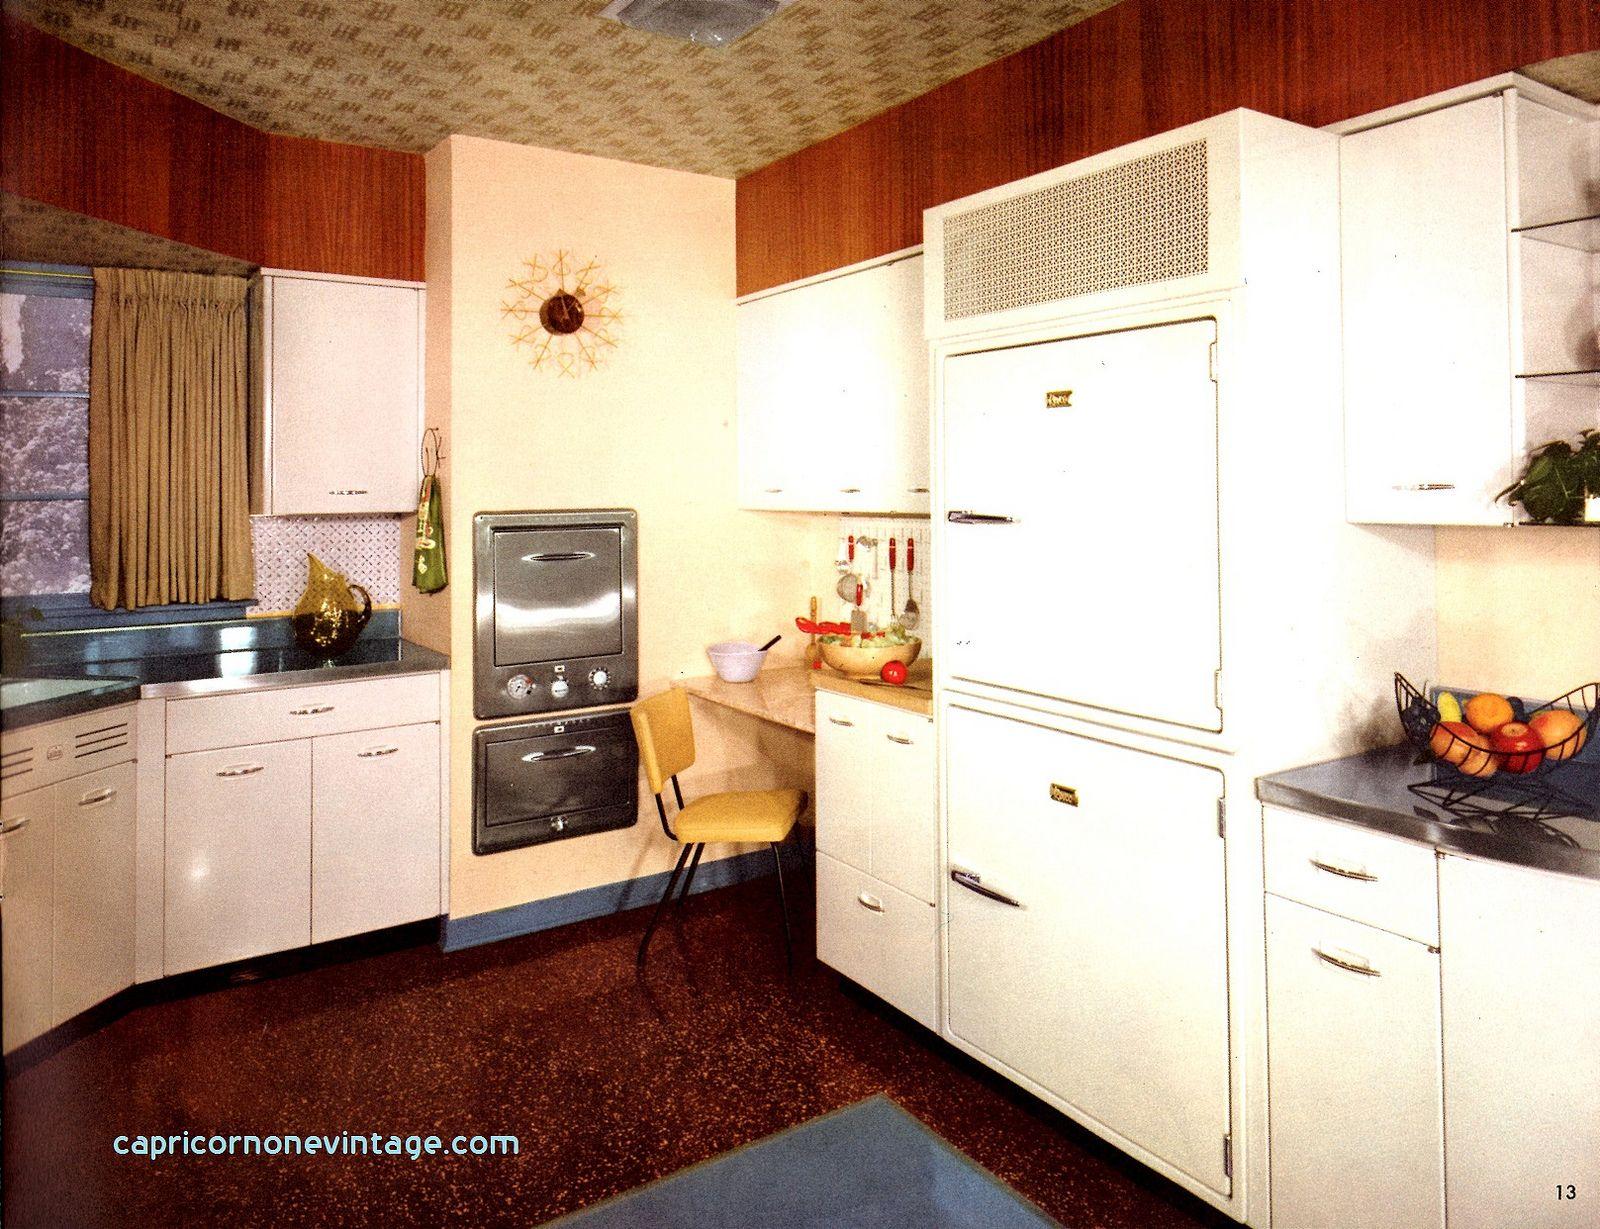 1955 Revco Bilt In Contemporary Kitchens In Charming Homes Catalog Retro Kitchen Contemporary Kitchen Kitchen